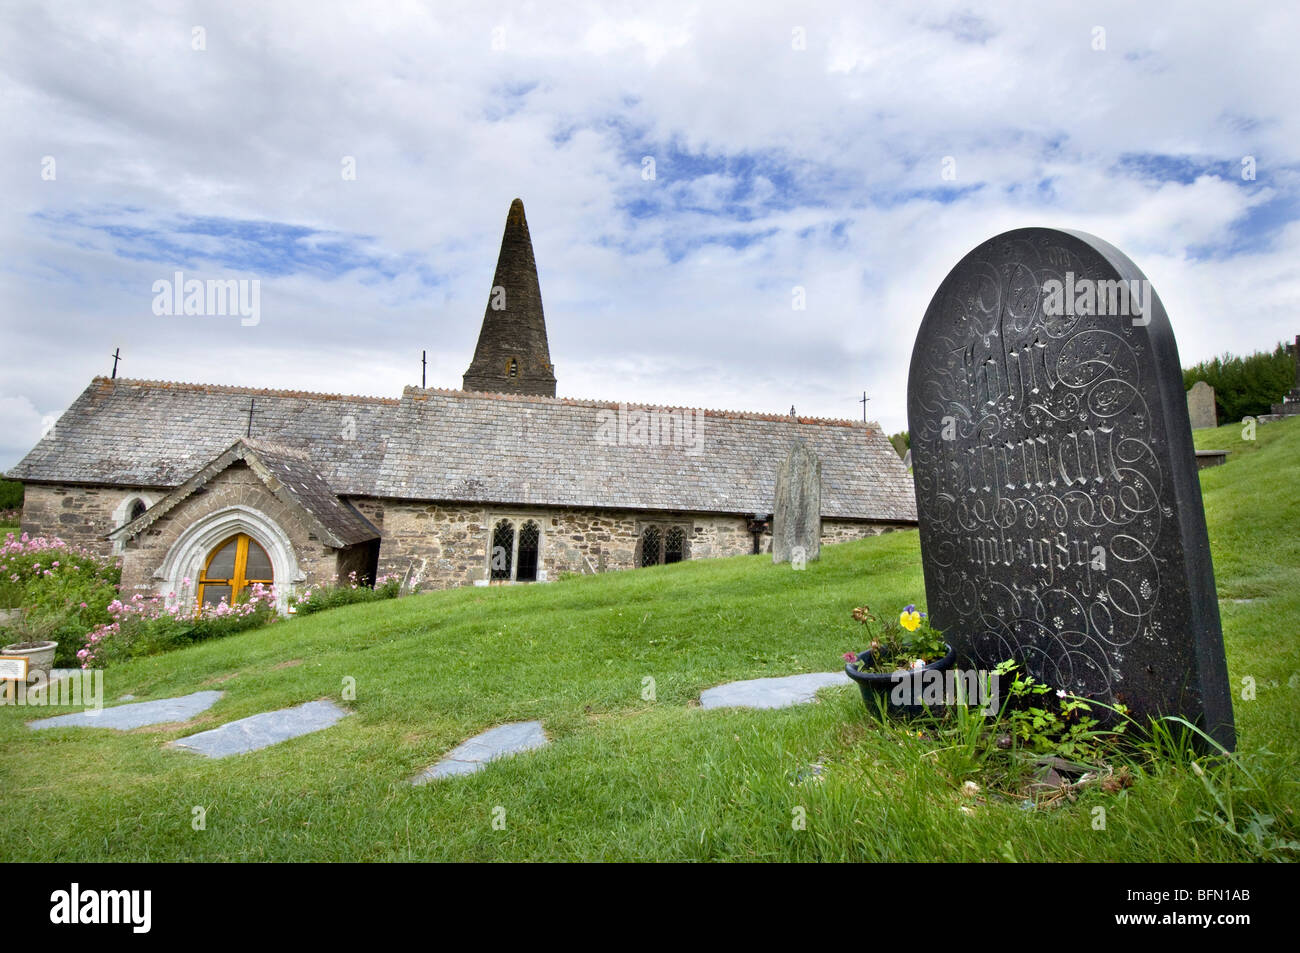 Poet Laureate Sir John Betjeman's grave and headstone carved on Delabole slate at St. Enadoc Church, Cornwall - Stock Image